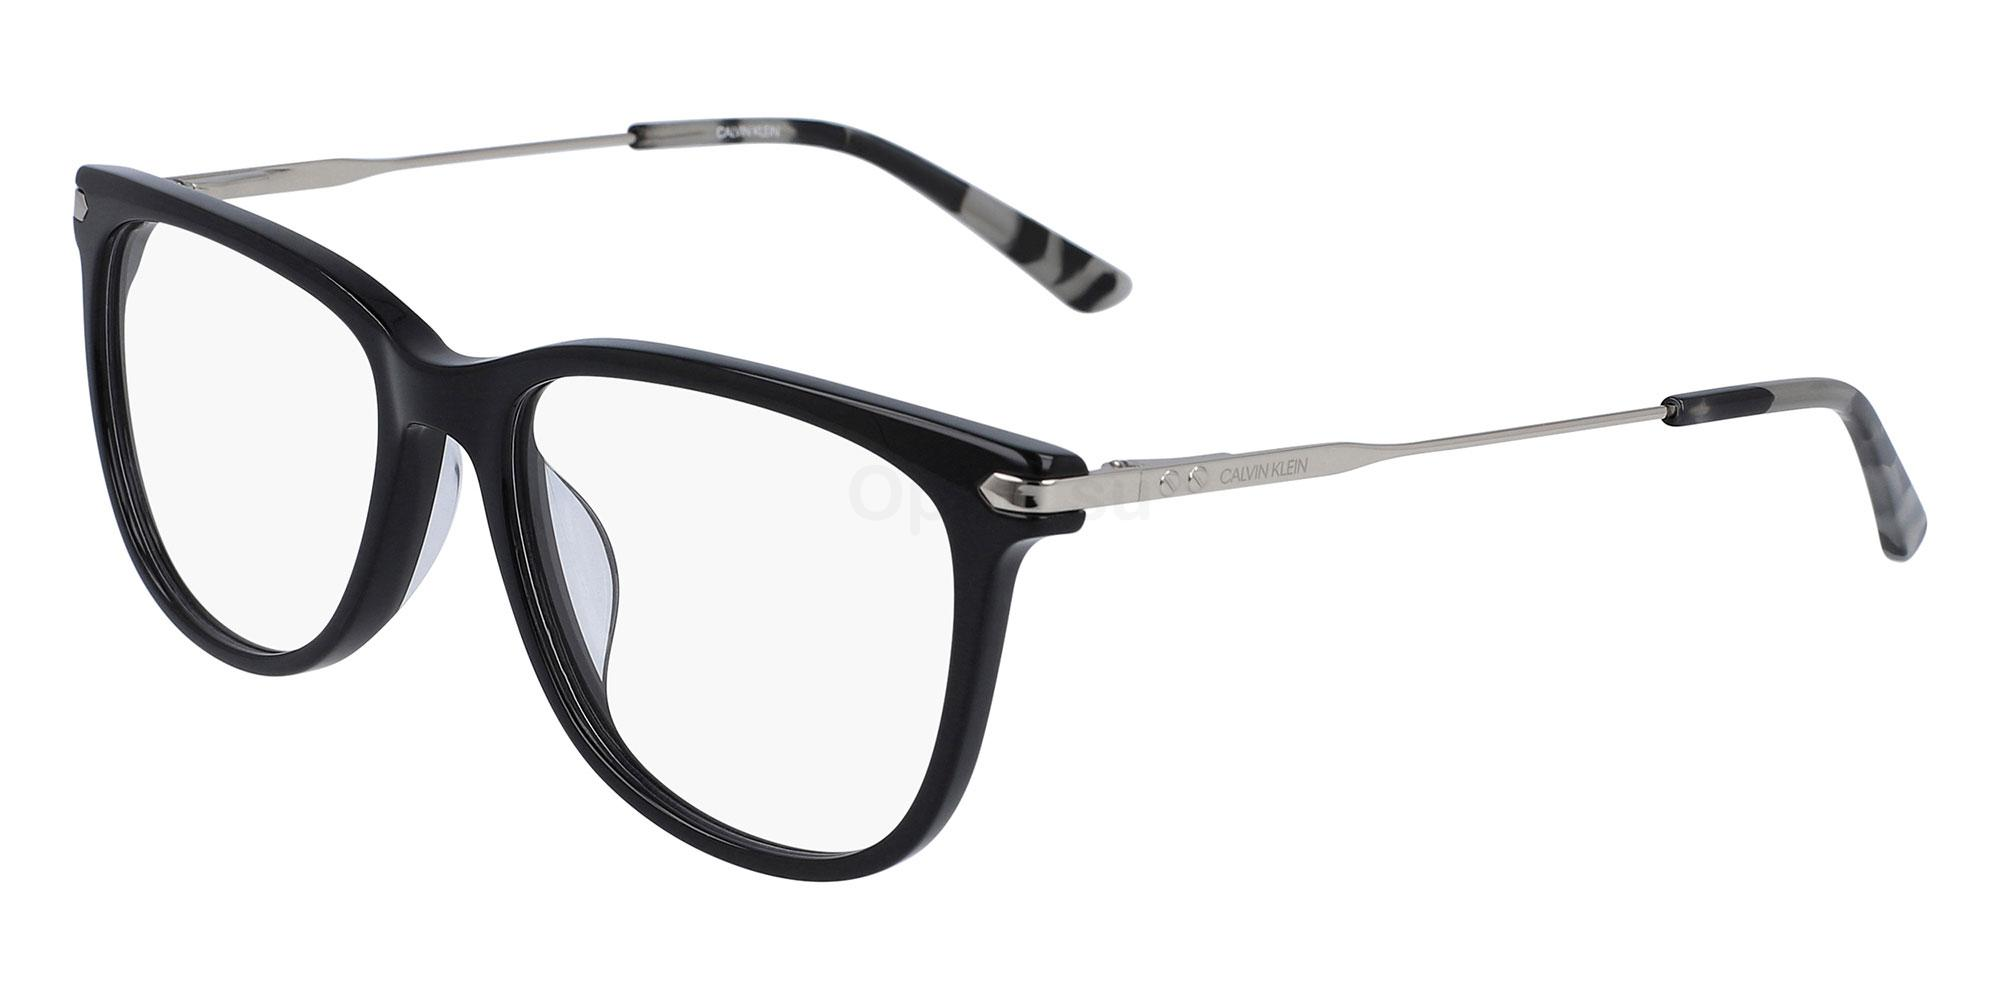 001 CK19704 Glasses, Calvin Klein